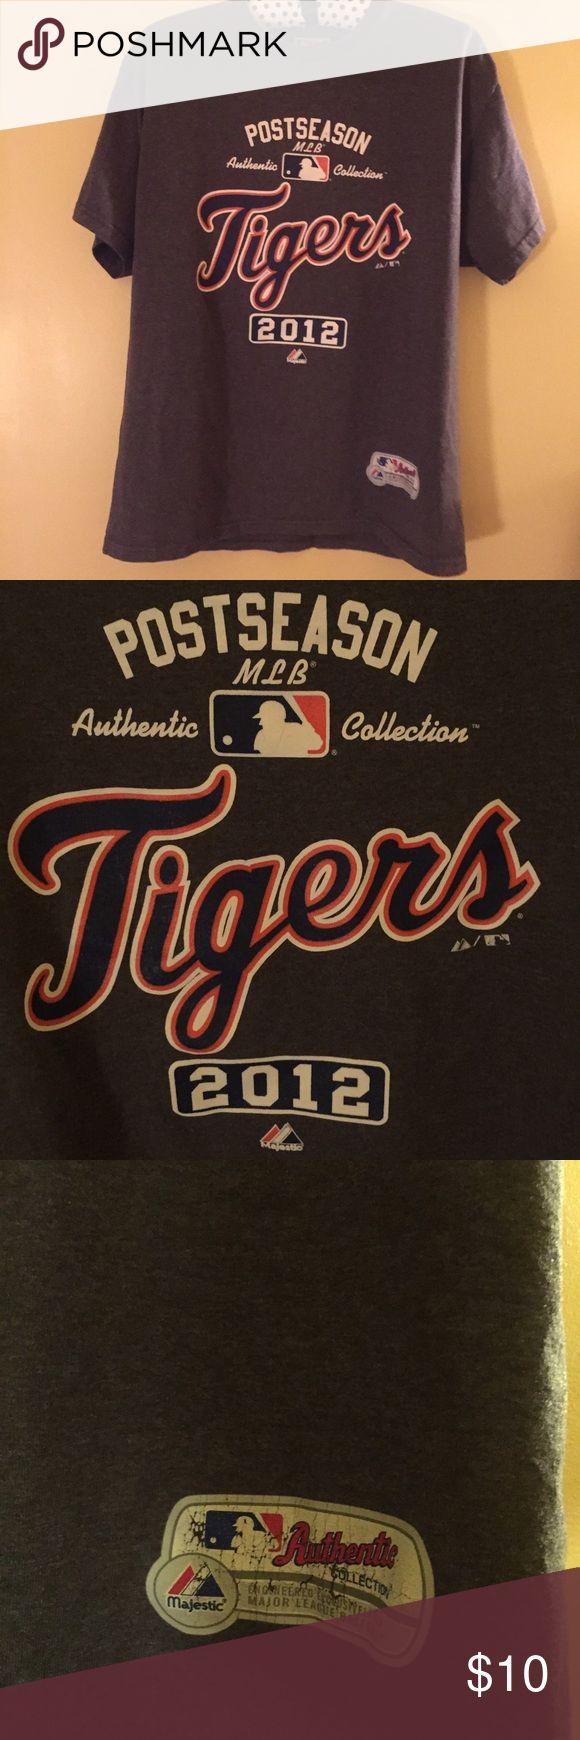 Detroit Tigers Tshirt Authentic Postseason 2012 Detroit Tigers Tshirt. As pictured. Major League Baseball Shirts Tees - Short Sleeve